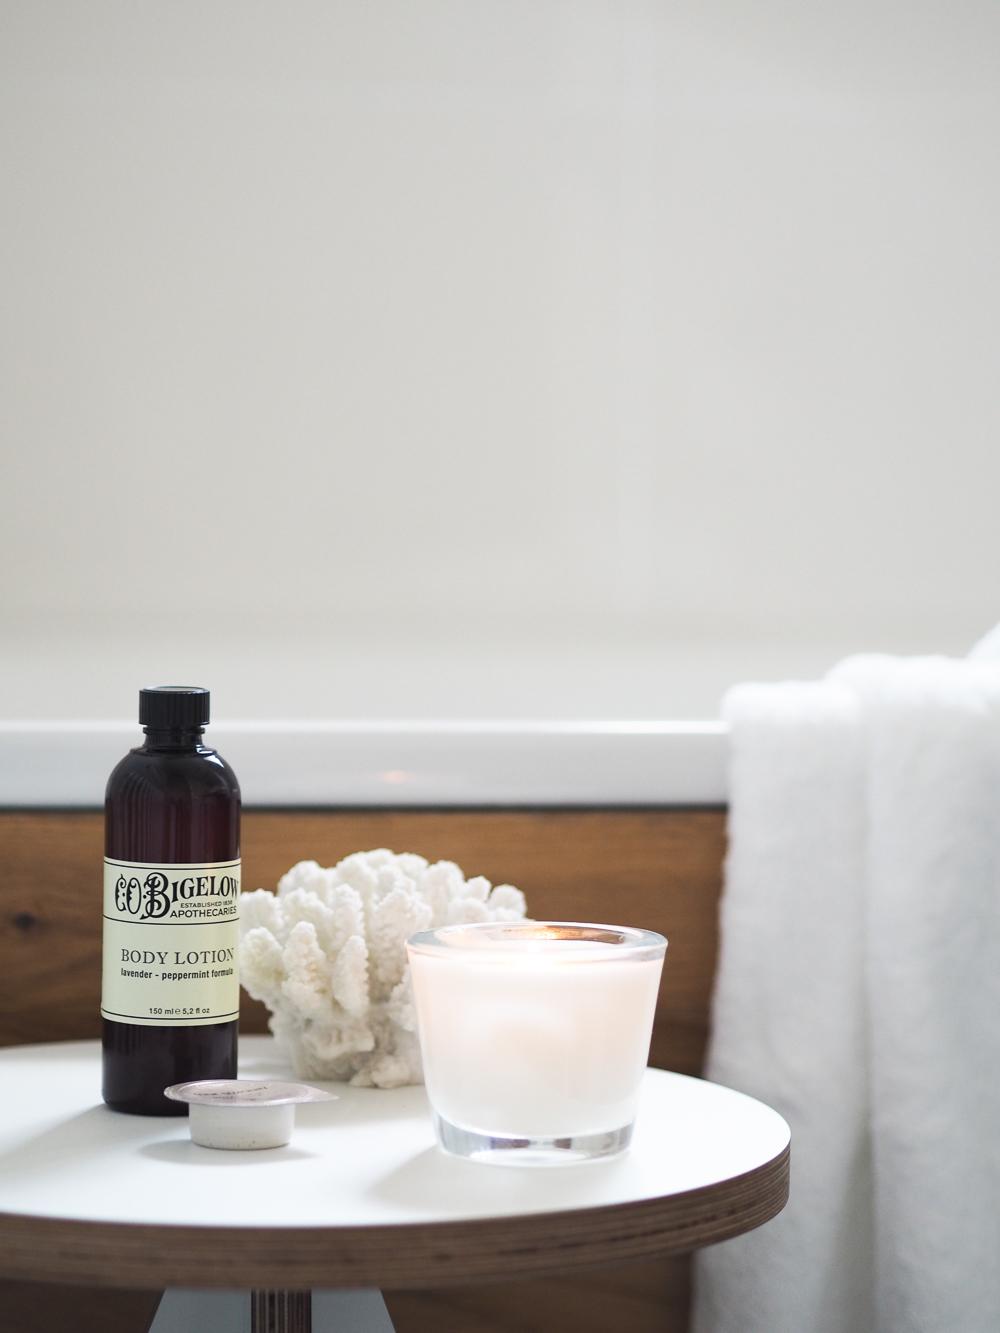 Bathtime treats for a home spa pamper session | Design Hunter